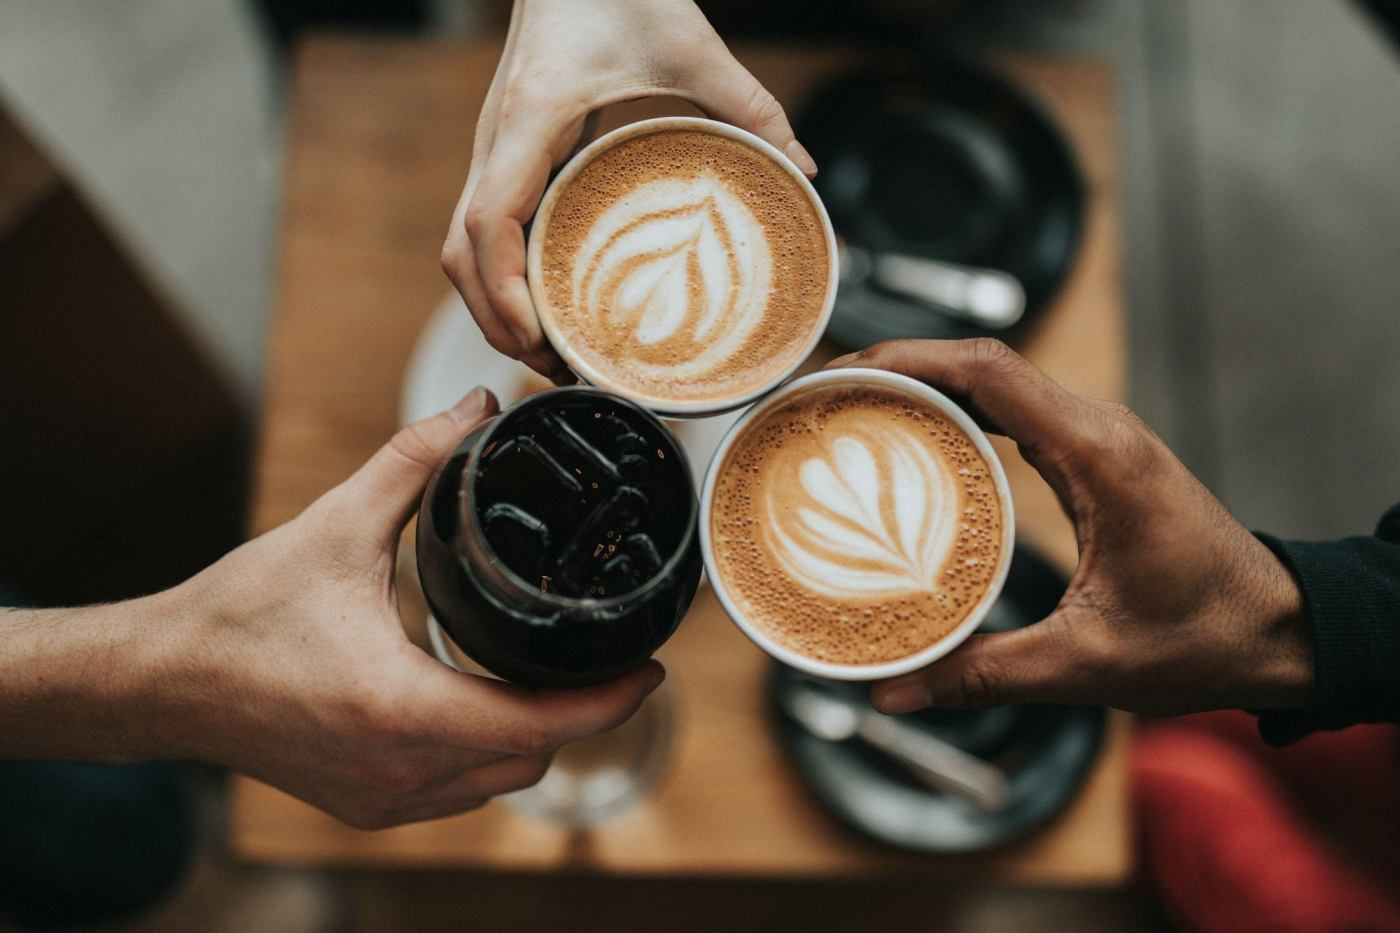 Una idea de negocios diferente! Abre un bar de café